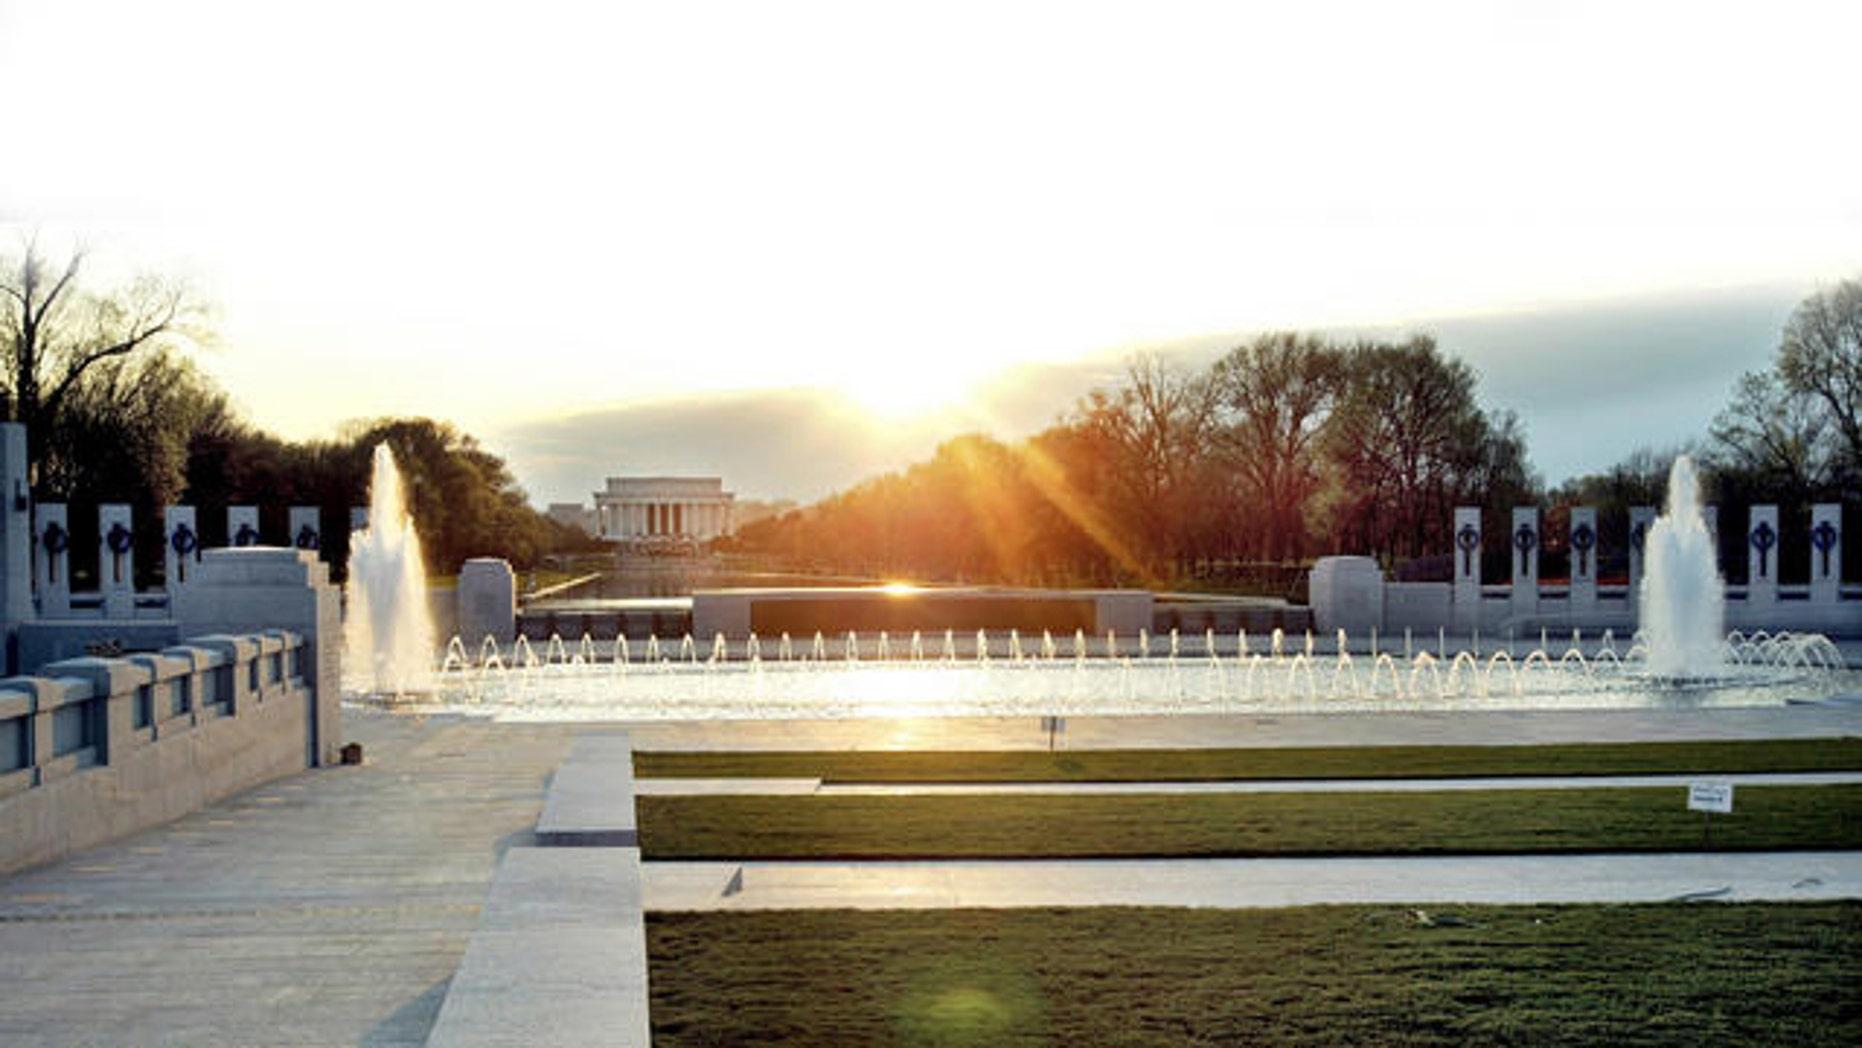 Shown here is the World War II Memorial in Washington, D.C.